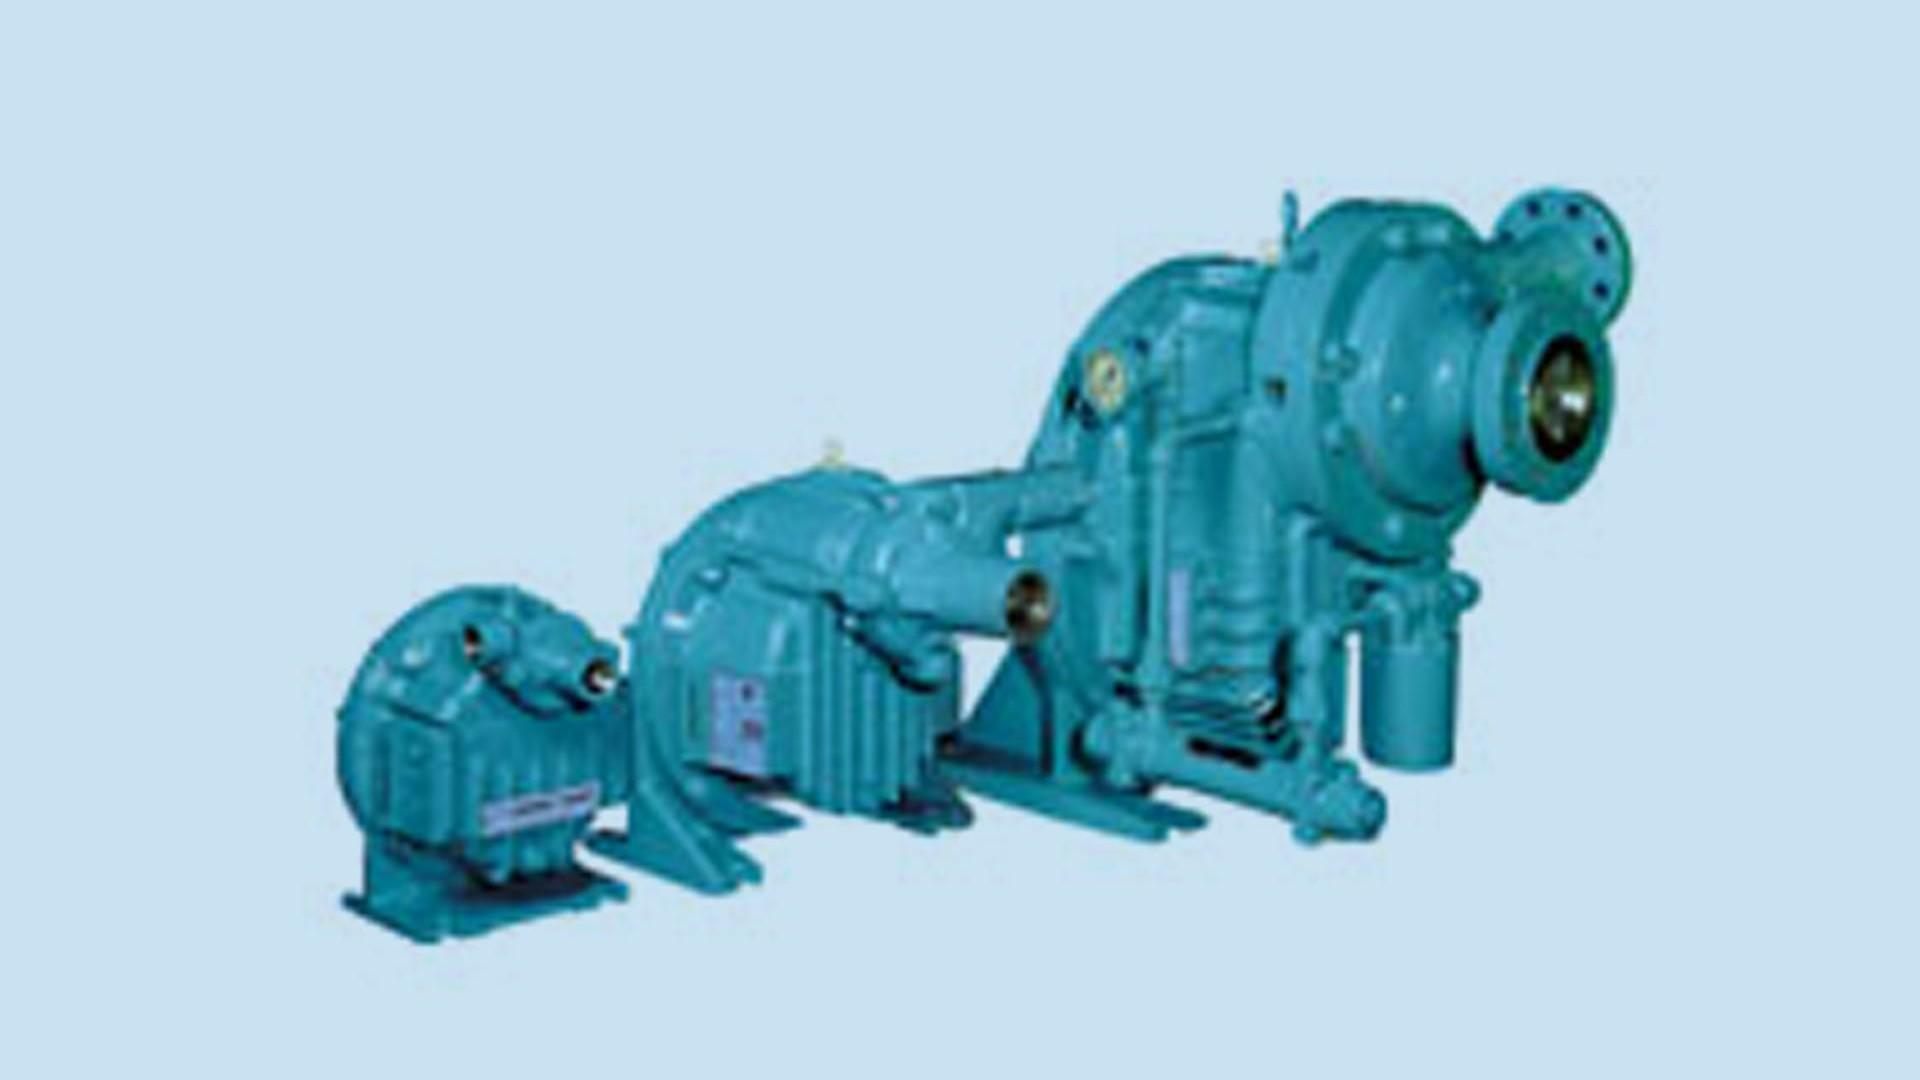 High pressure centrifugal pumps